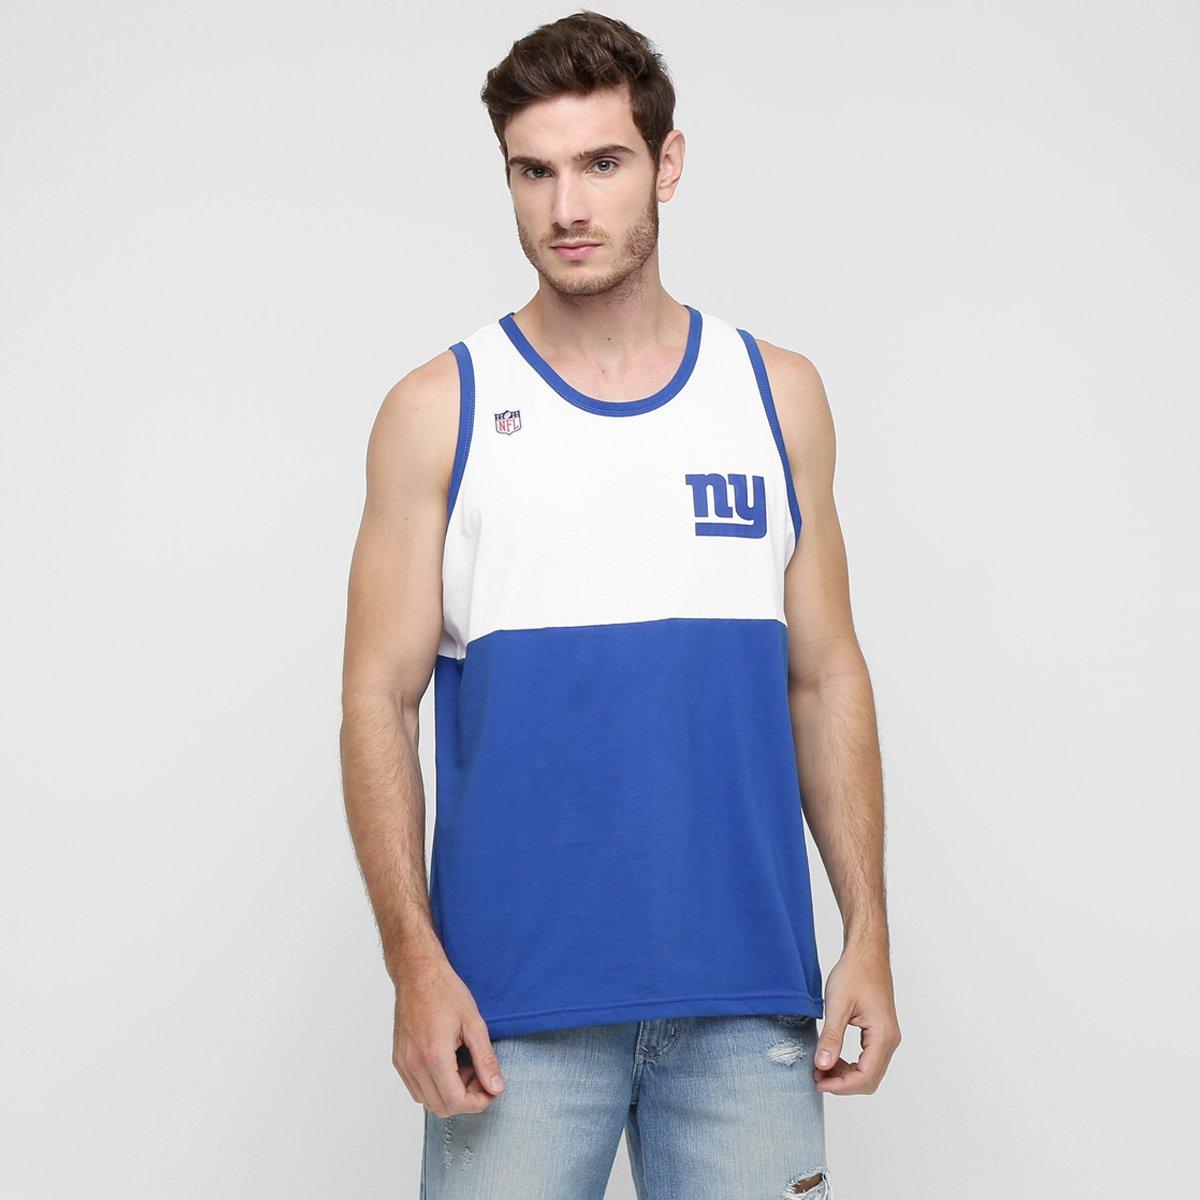 8b47697af9 Camiseta Regata New Era NFL Half New York Giants